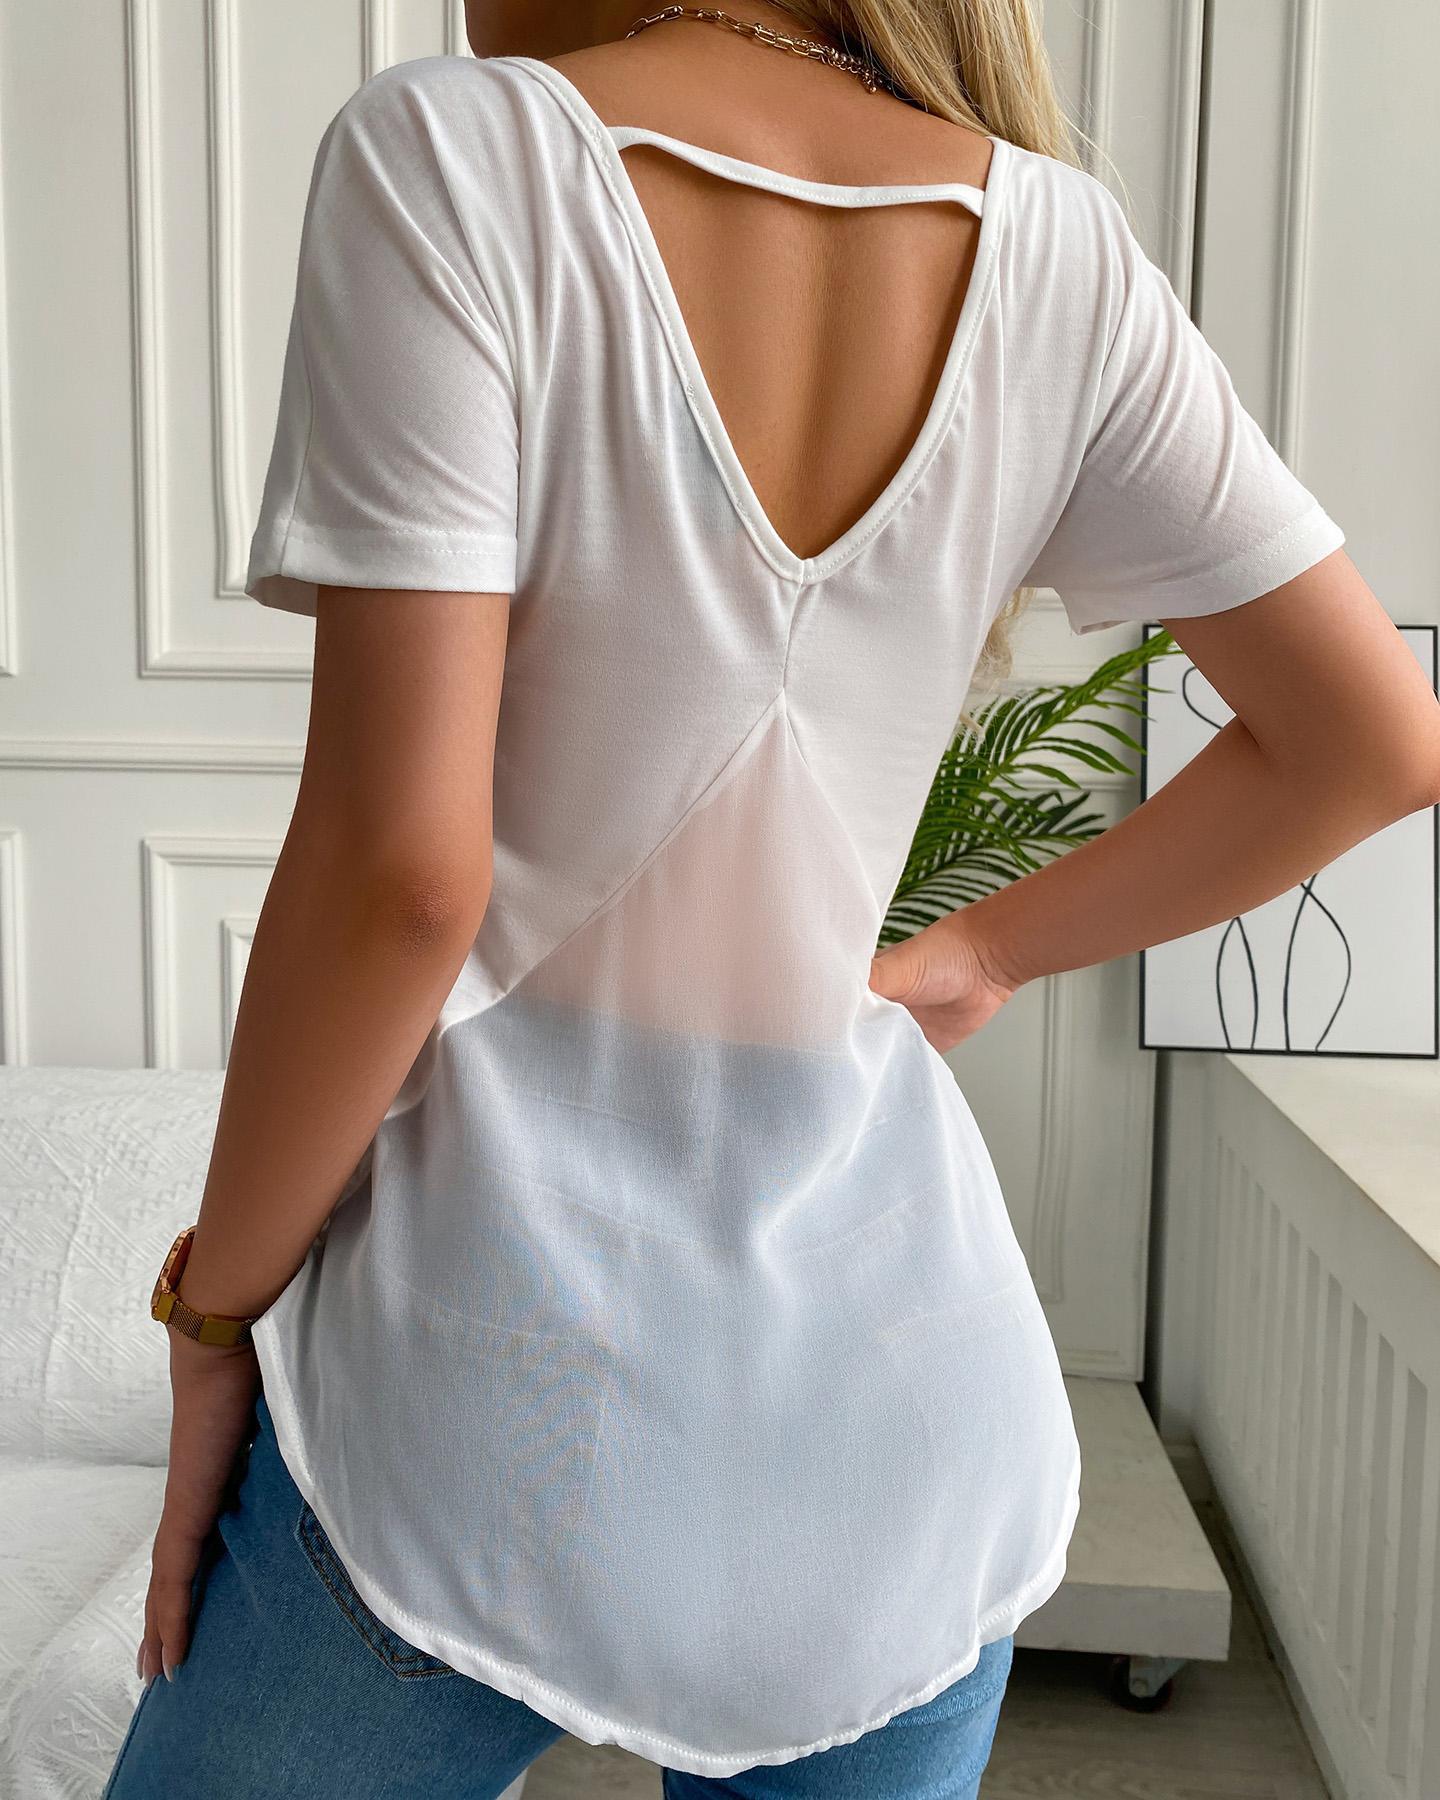 Short Sleeve Sheer Mesh Cutout Back Top, White